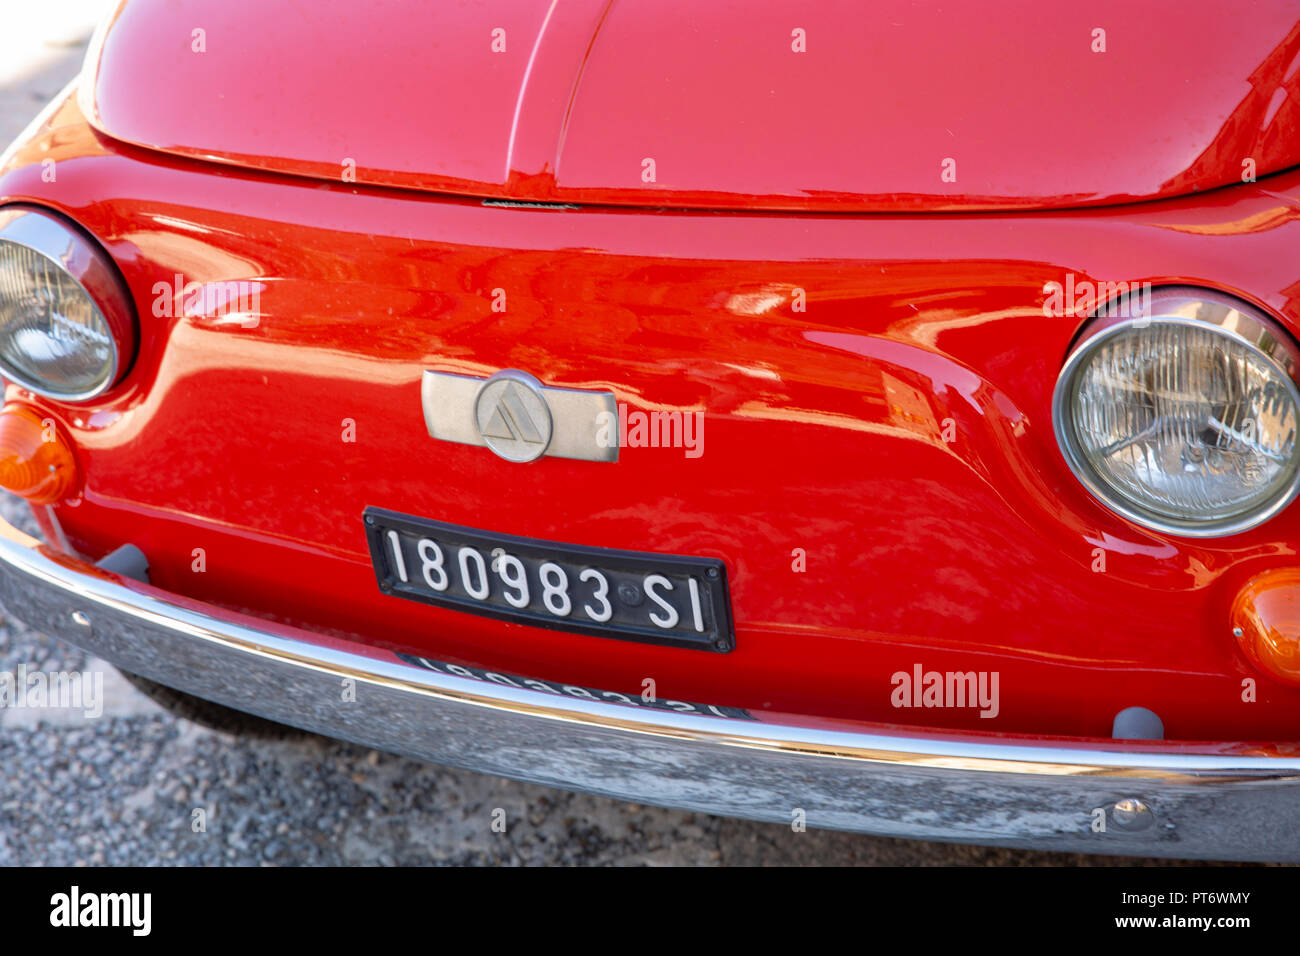 Classic vintage Fiat 500 Giardiniera motor car parked in Montepulciano,Tuscany,Italy - Stock Image